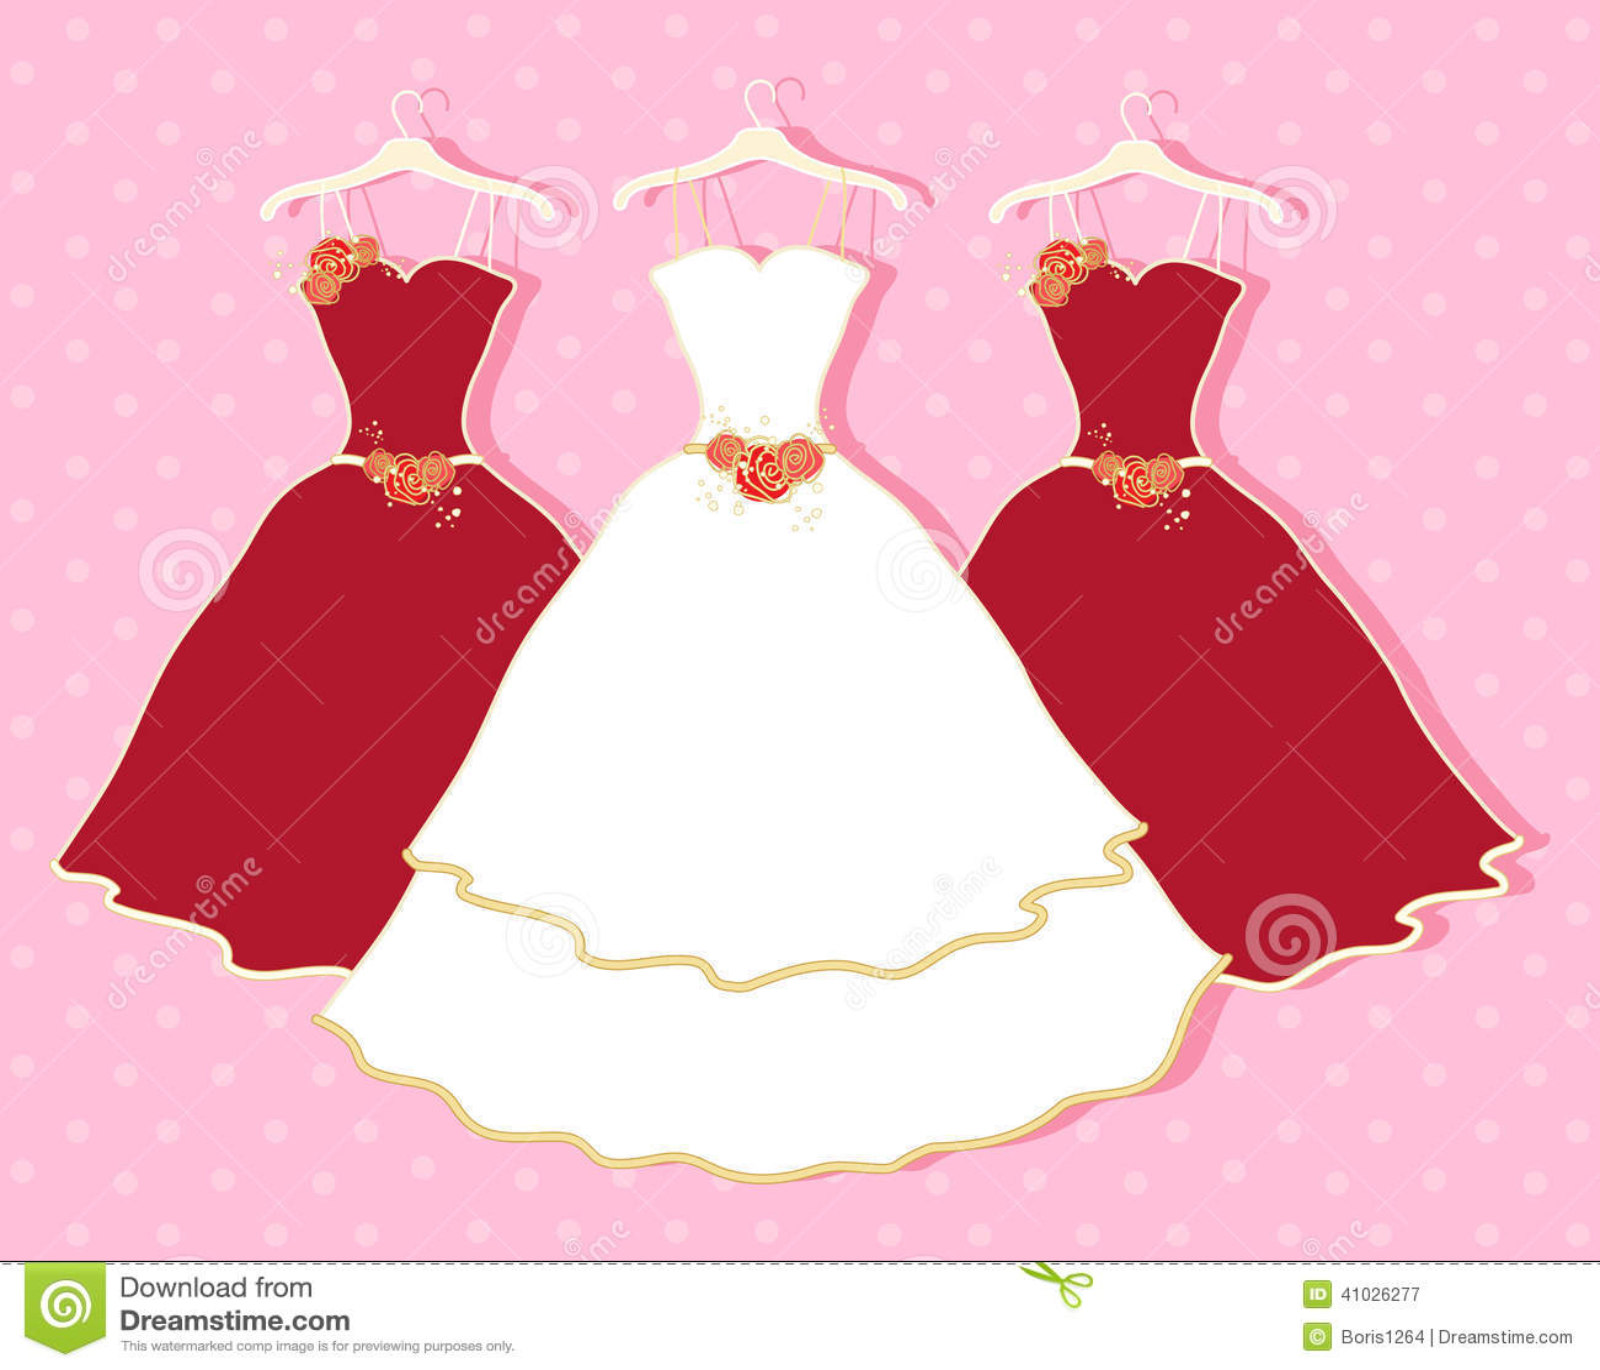 Abstract wedding dress stock vector. Illustration of romance - 41026277